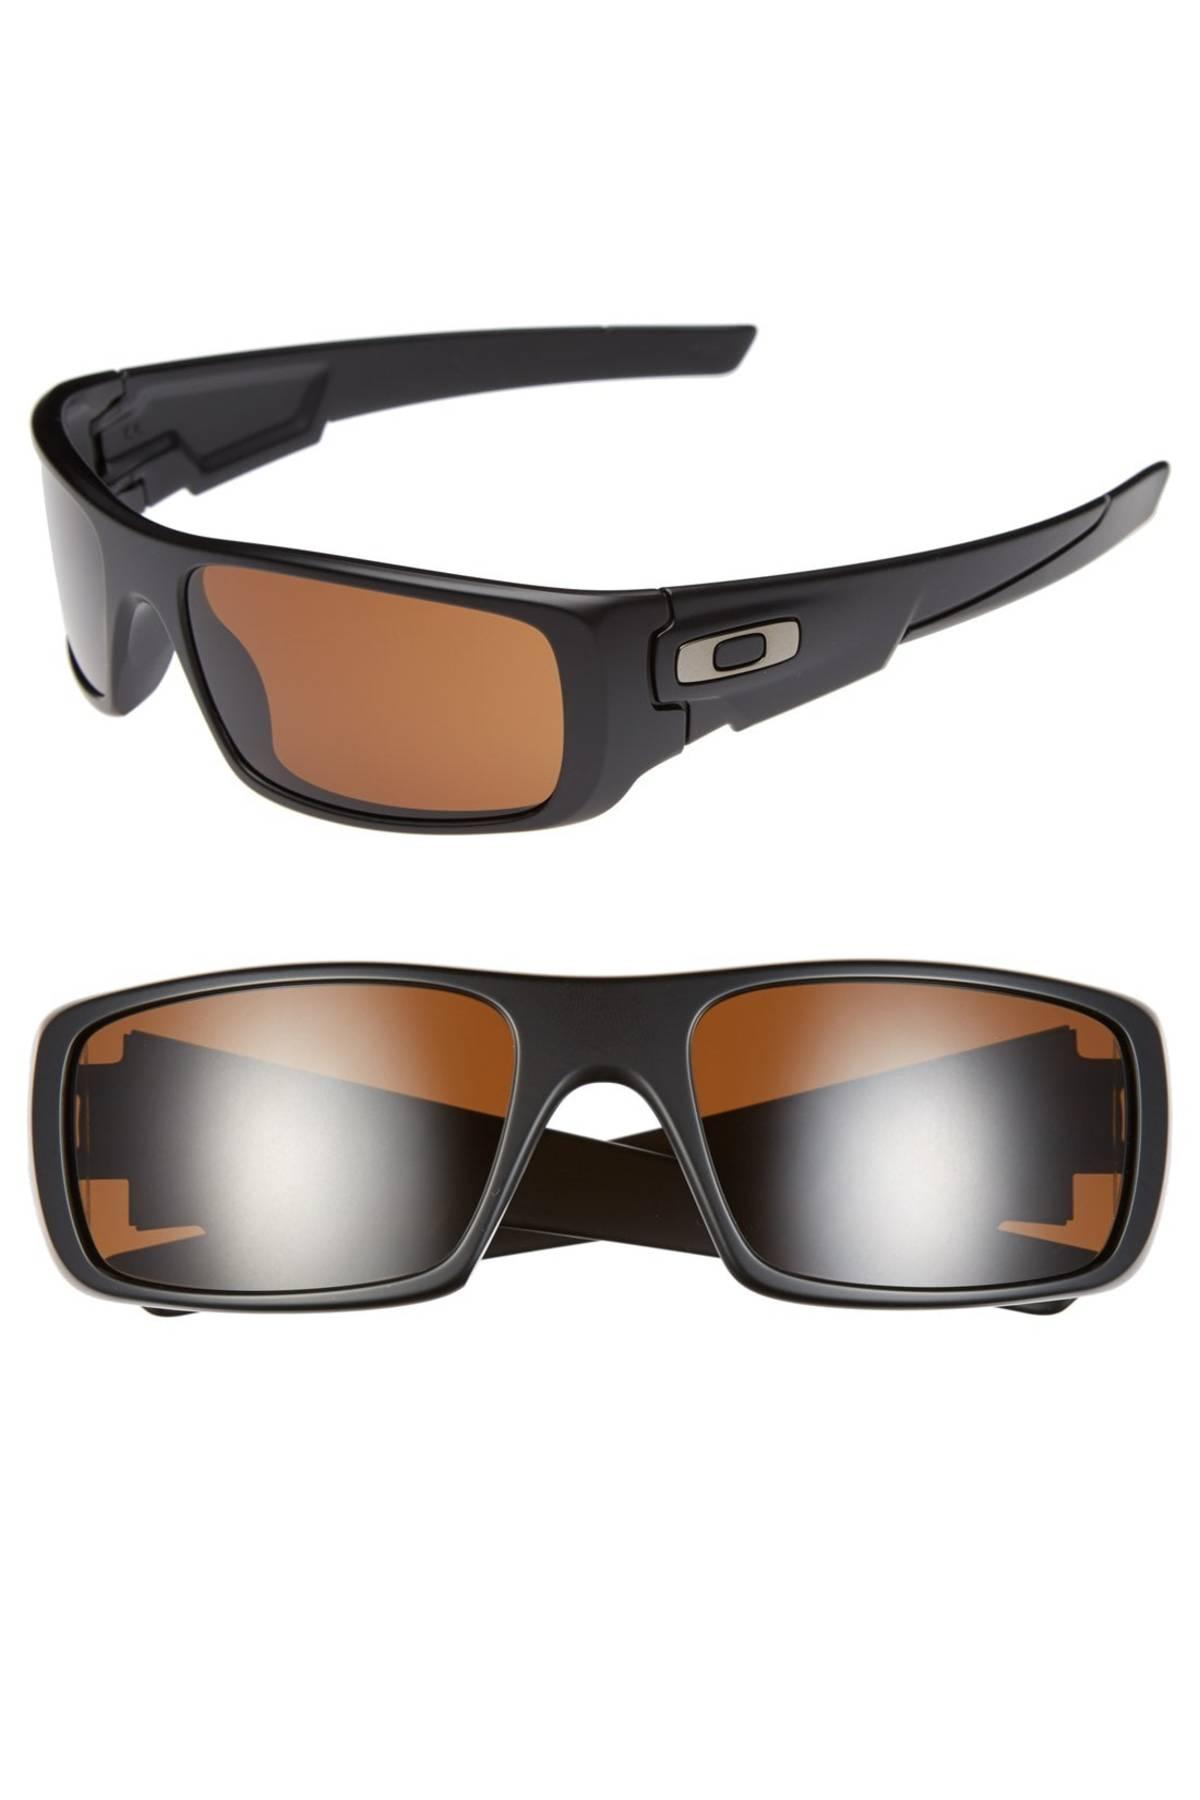 Oakley 'Crankshaft' Sunglasses $49.97